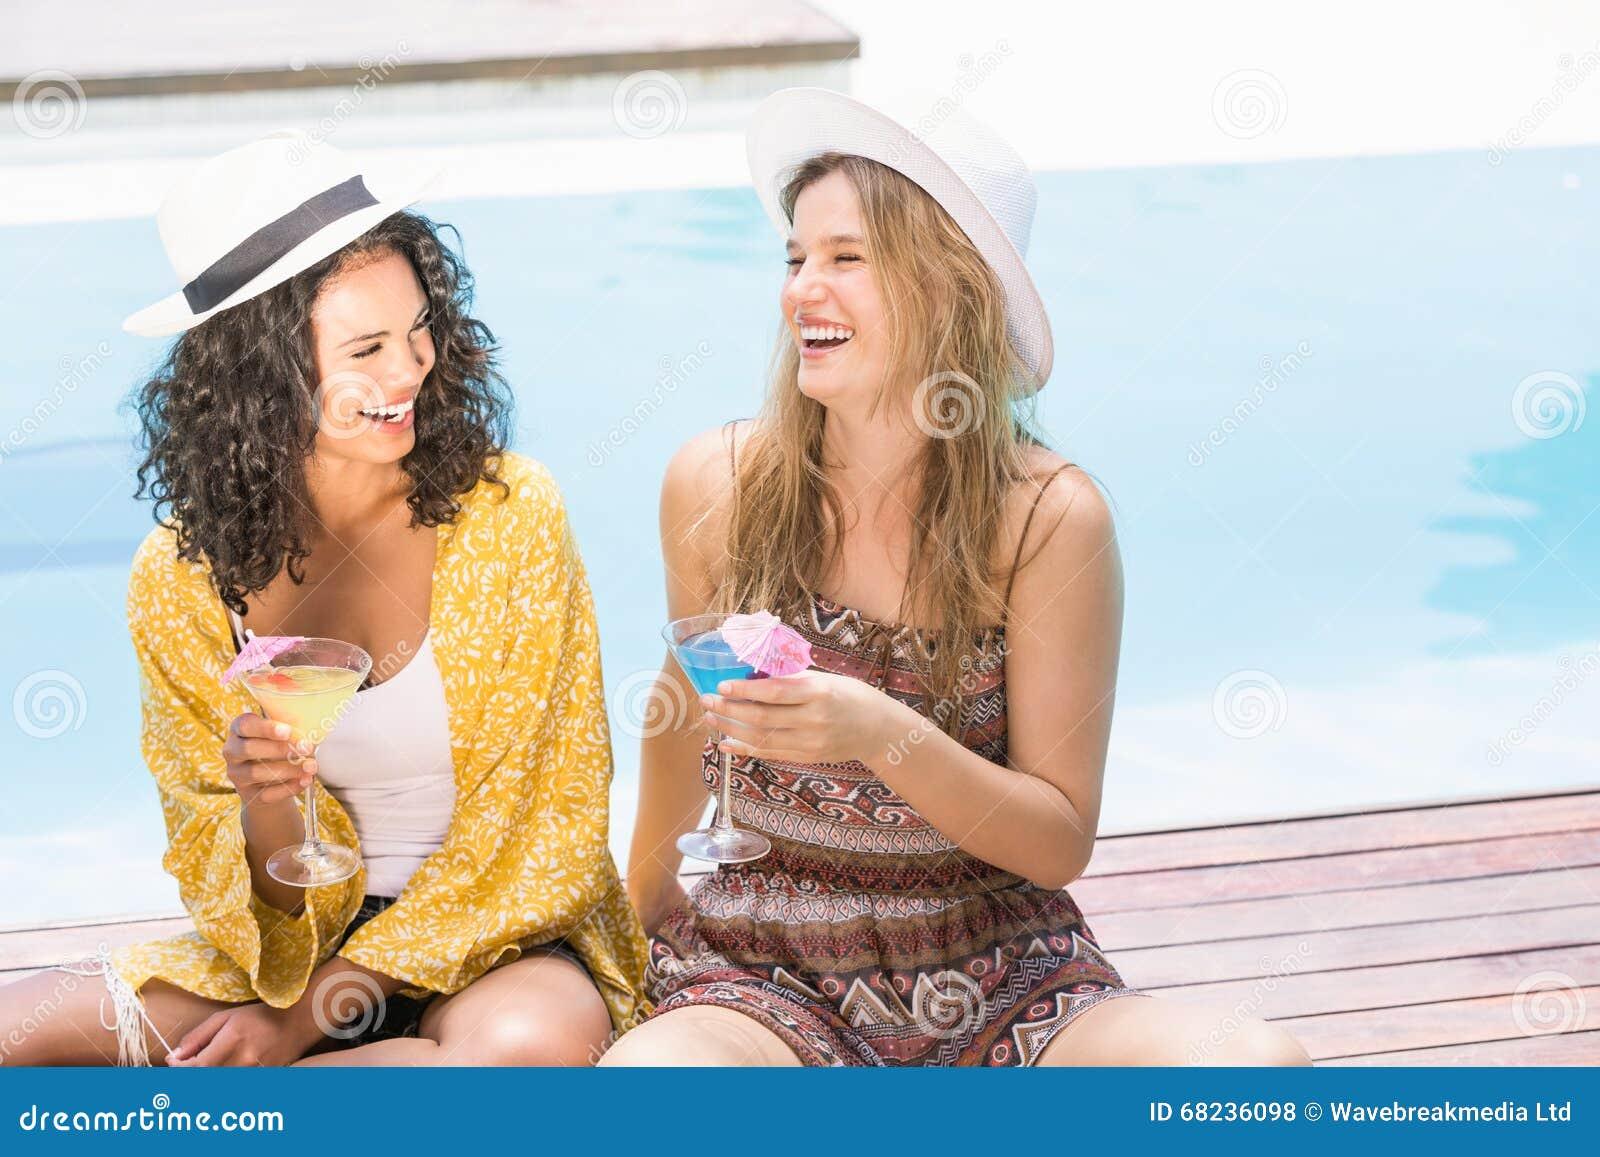 Young women having martini near pool